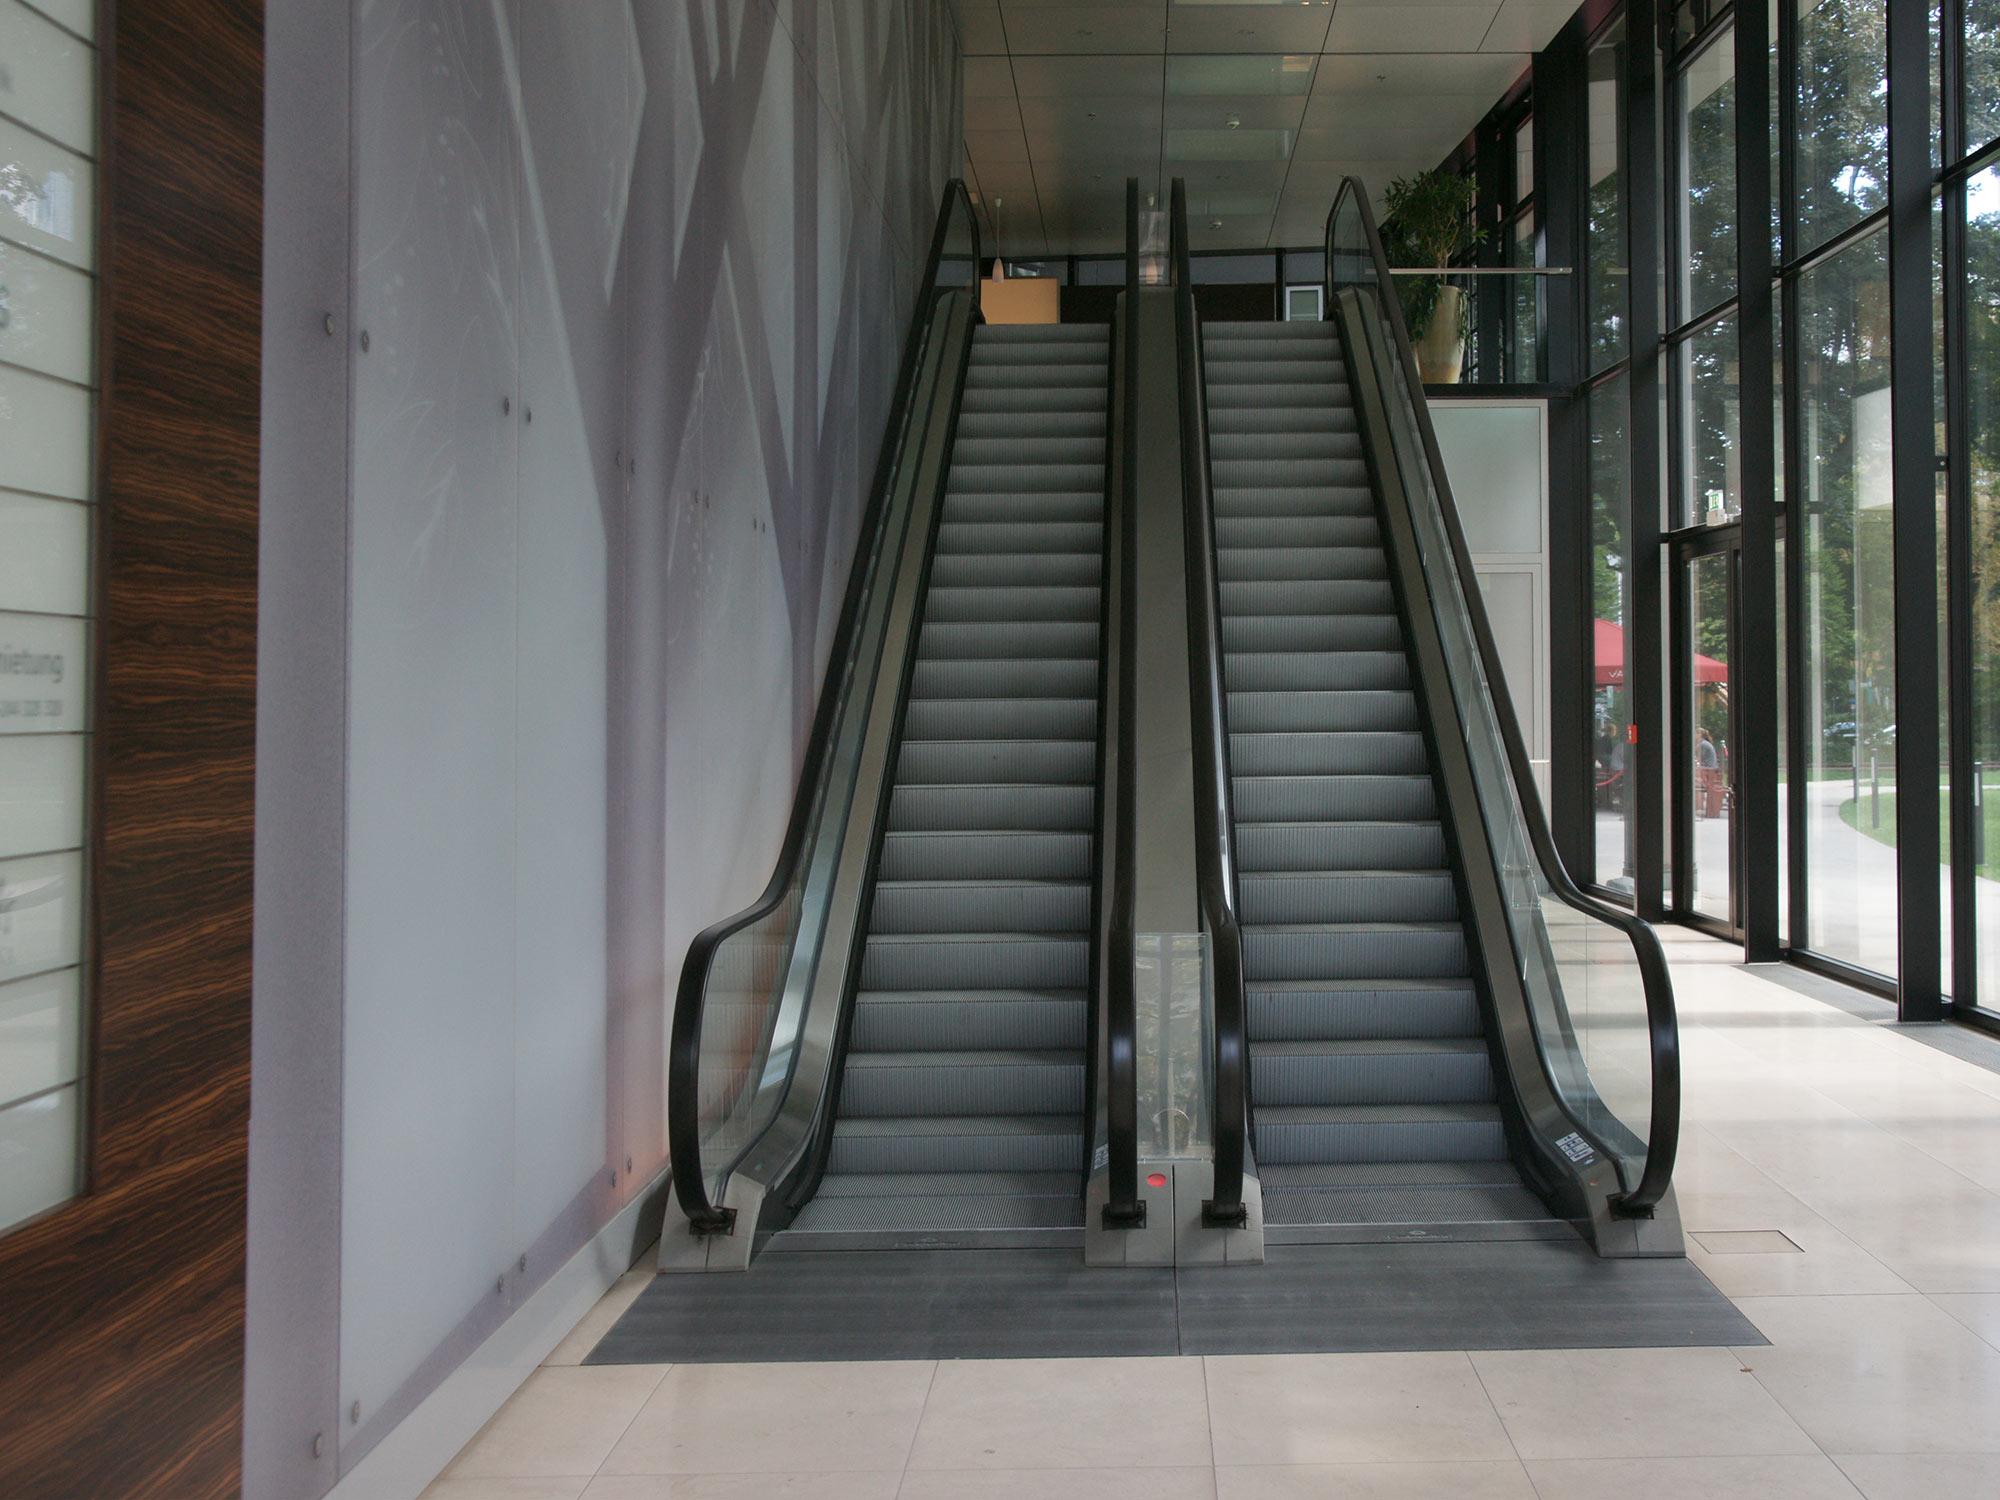 Rolltreppen im Eingangsbereich - Lobby Westend Duo - Büroturm Frankfurt